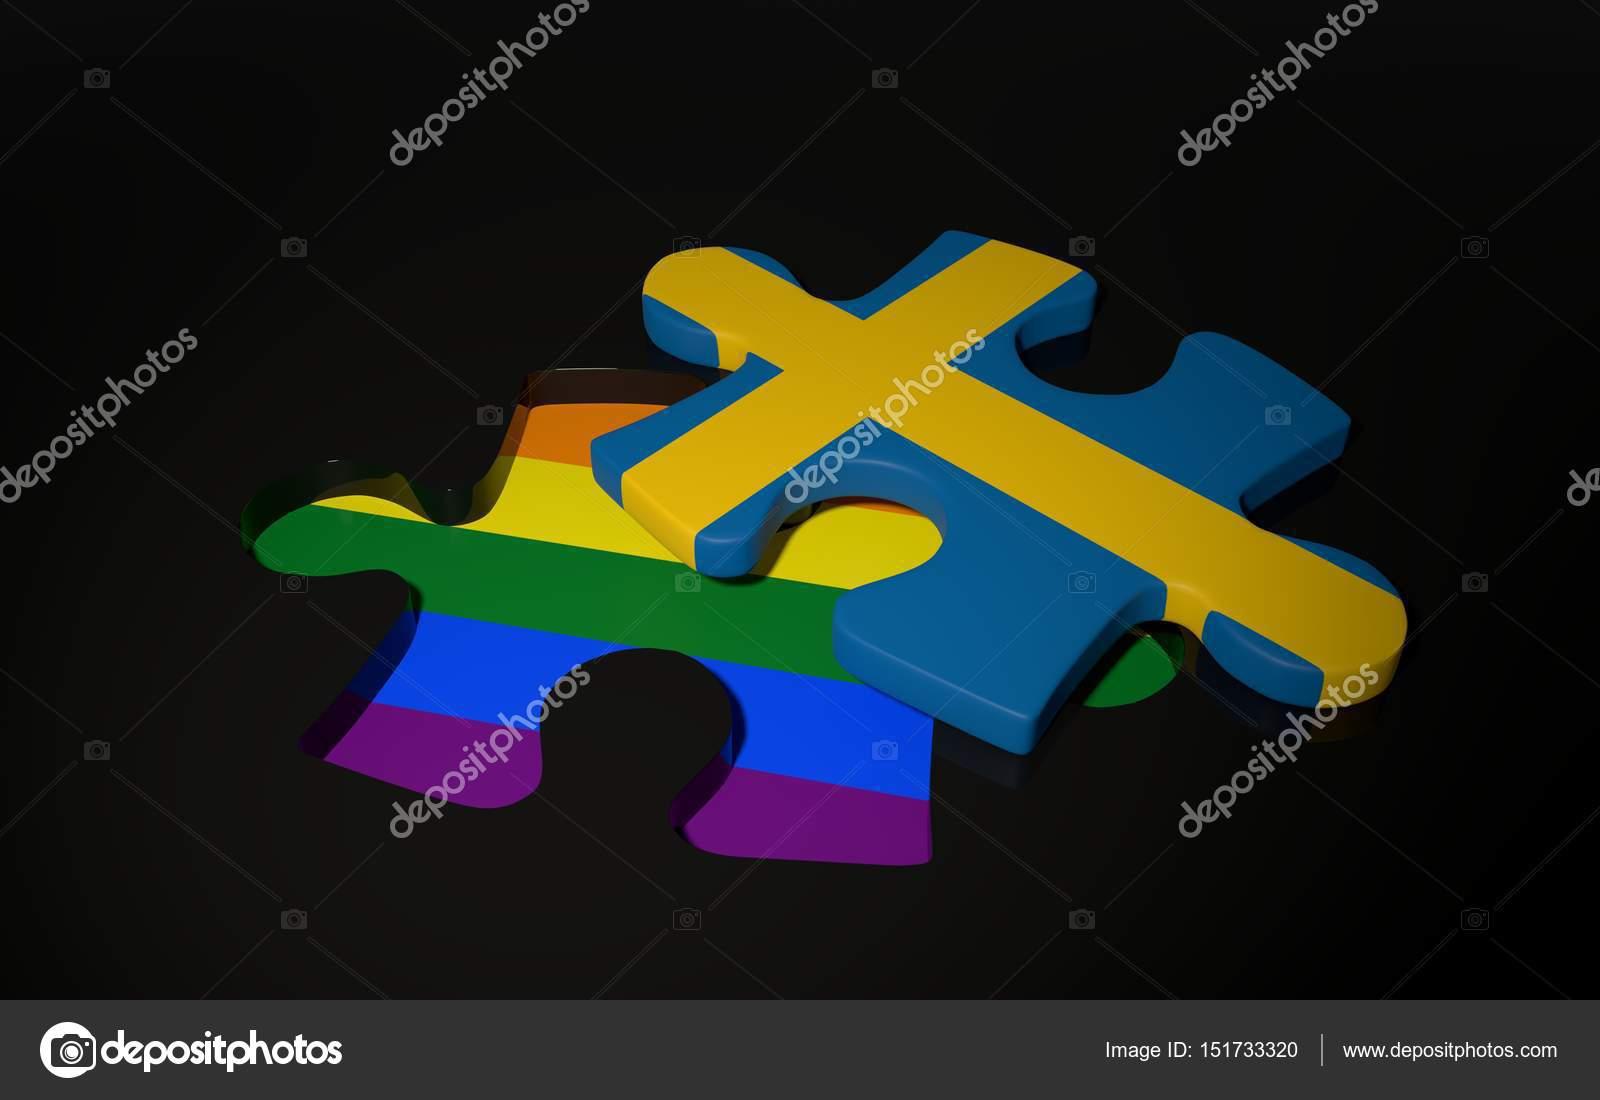 Hledá se pohodový gay kamarád na spolucestování směr sever(Skandinávie,Benelux,Británie a doma Ústecký a Liberecký kraj).